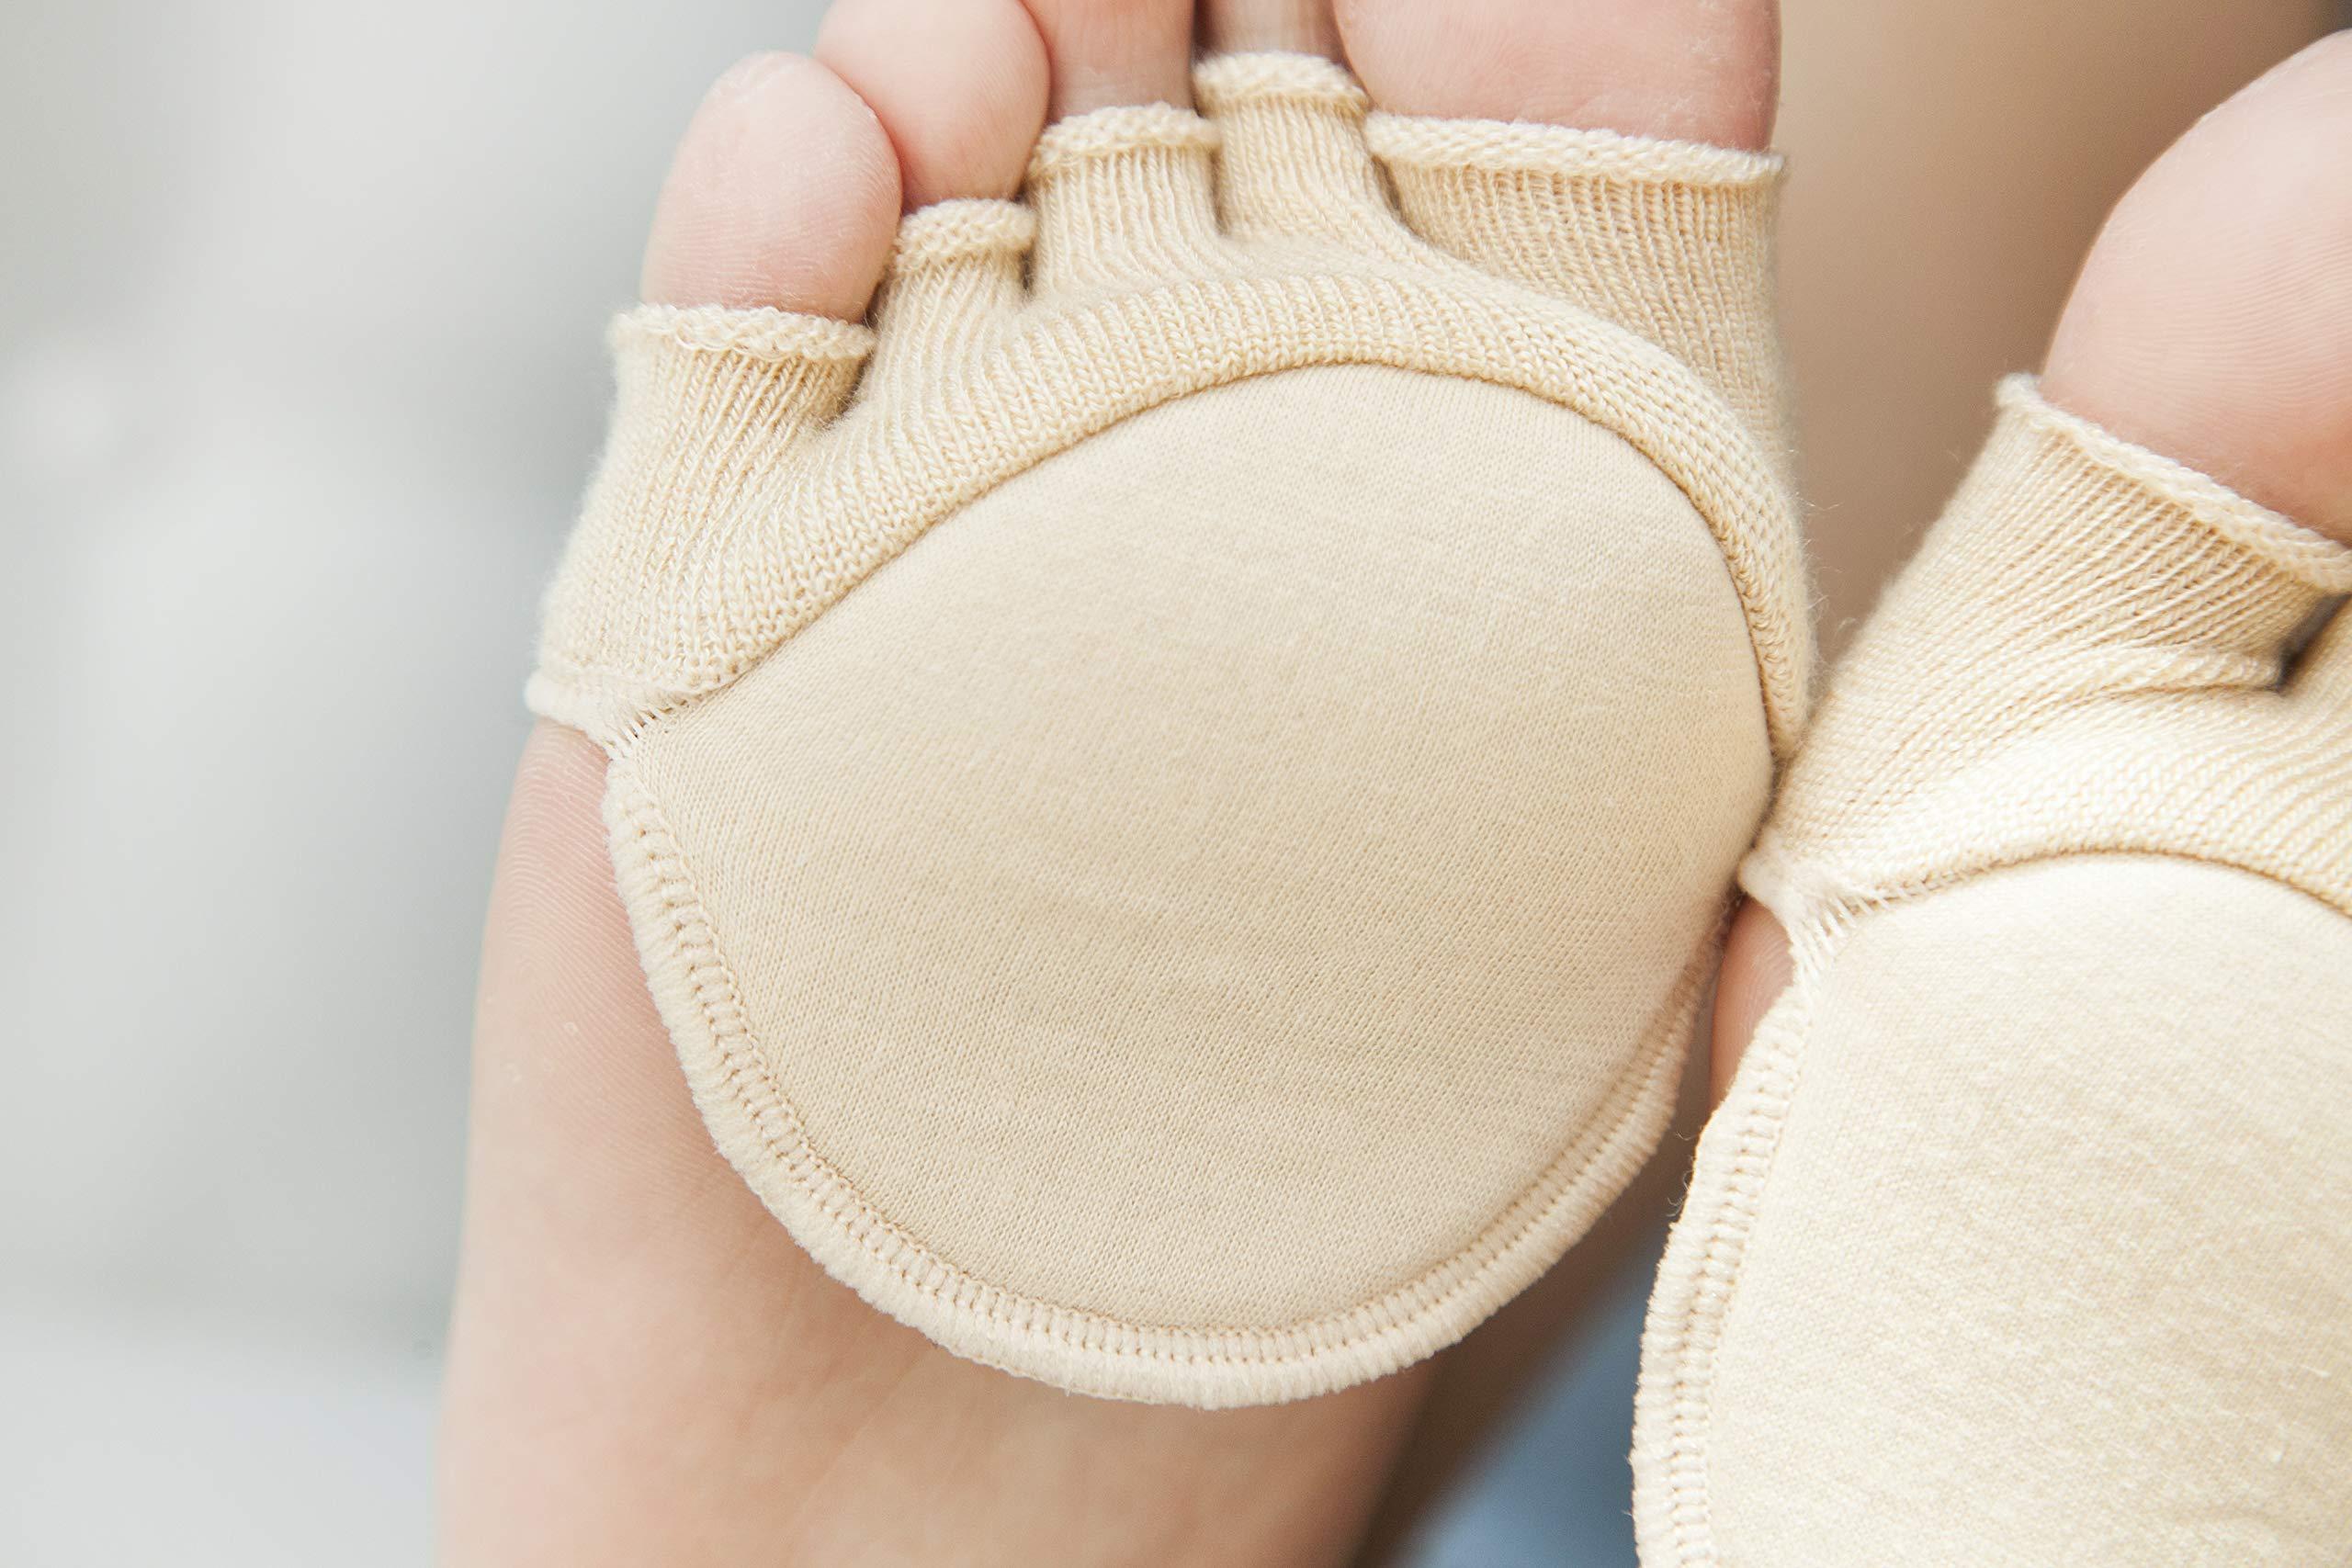 Toe Socks, Cotton Non-Slip Women's Toe Toppers Socks Toe Separating Socks No-Show Half Socks Barre Pilates Yoga Half Palm Socks(2 Pairs) by Pnrskter (Image #6)